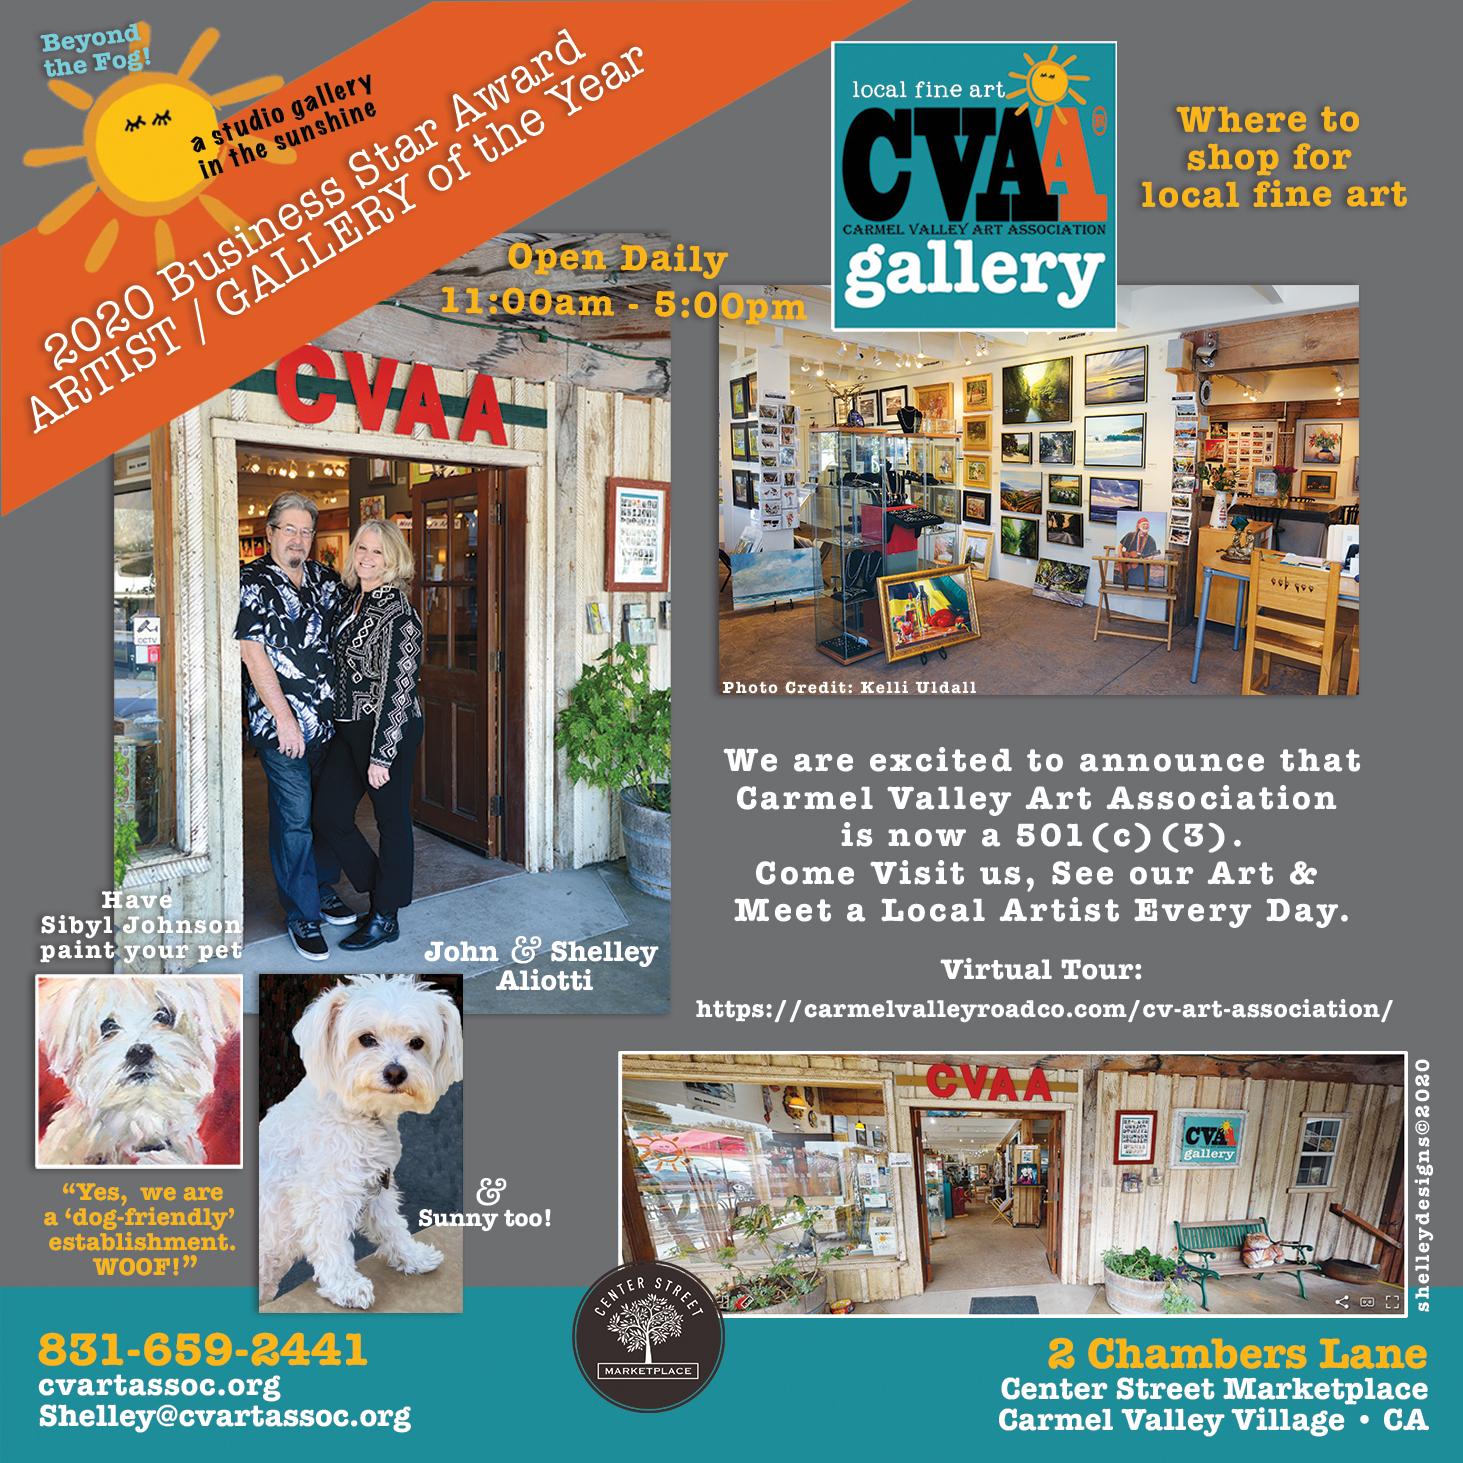 Visual describing Carmel Valley Art Assn.'s recent change to 501(c)(3) status.